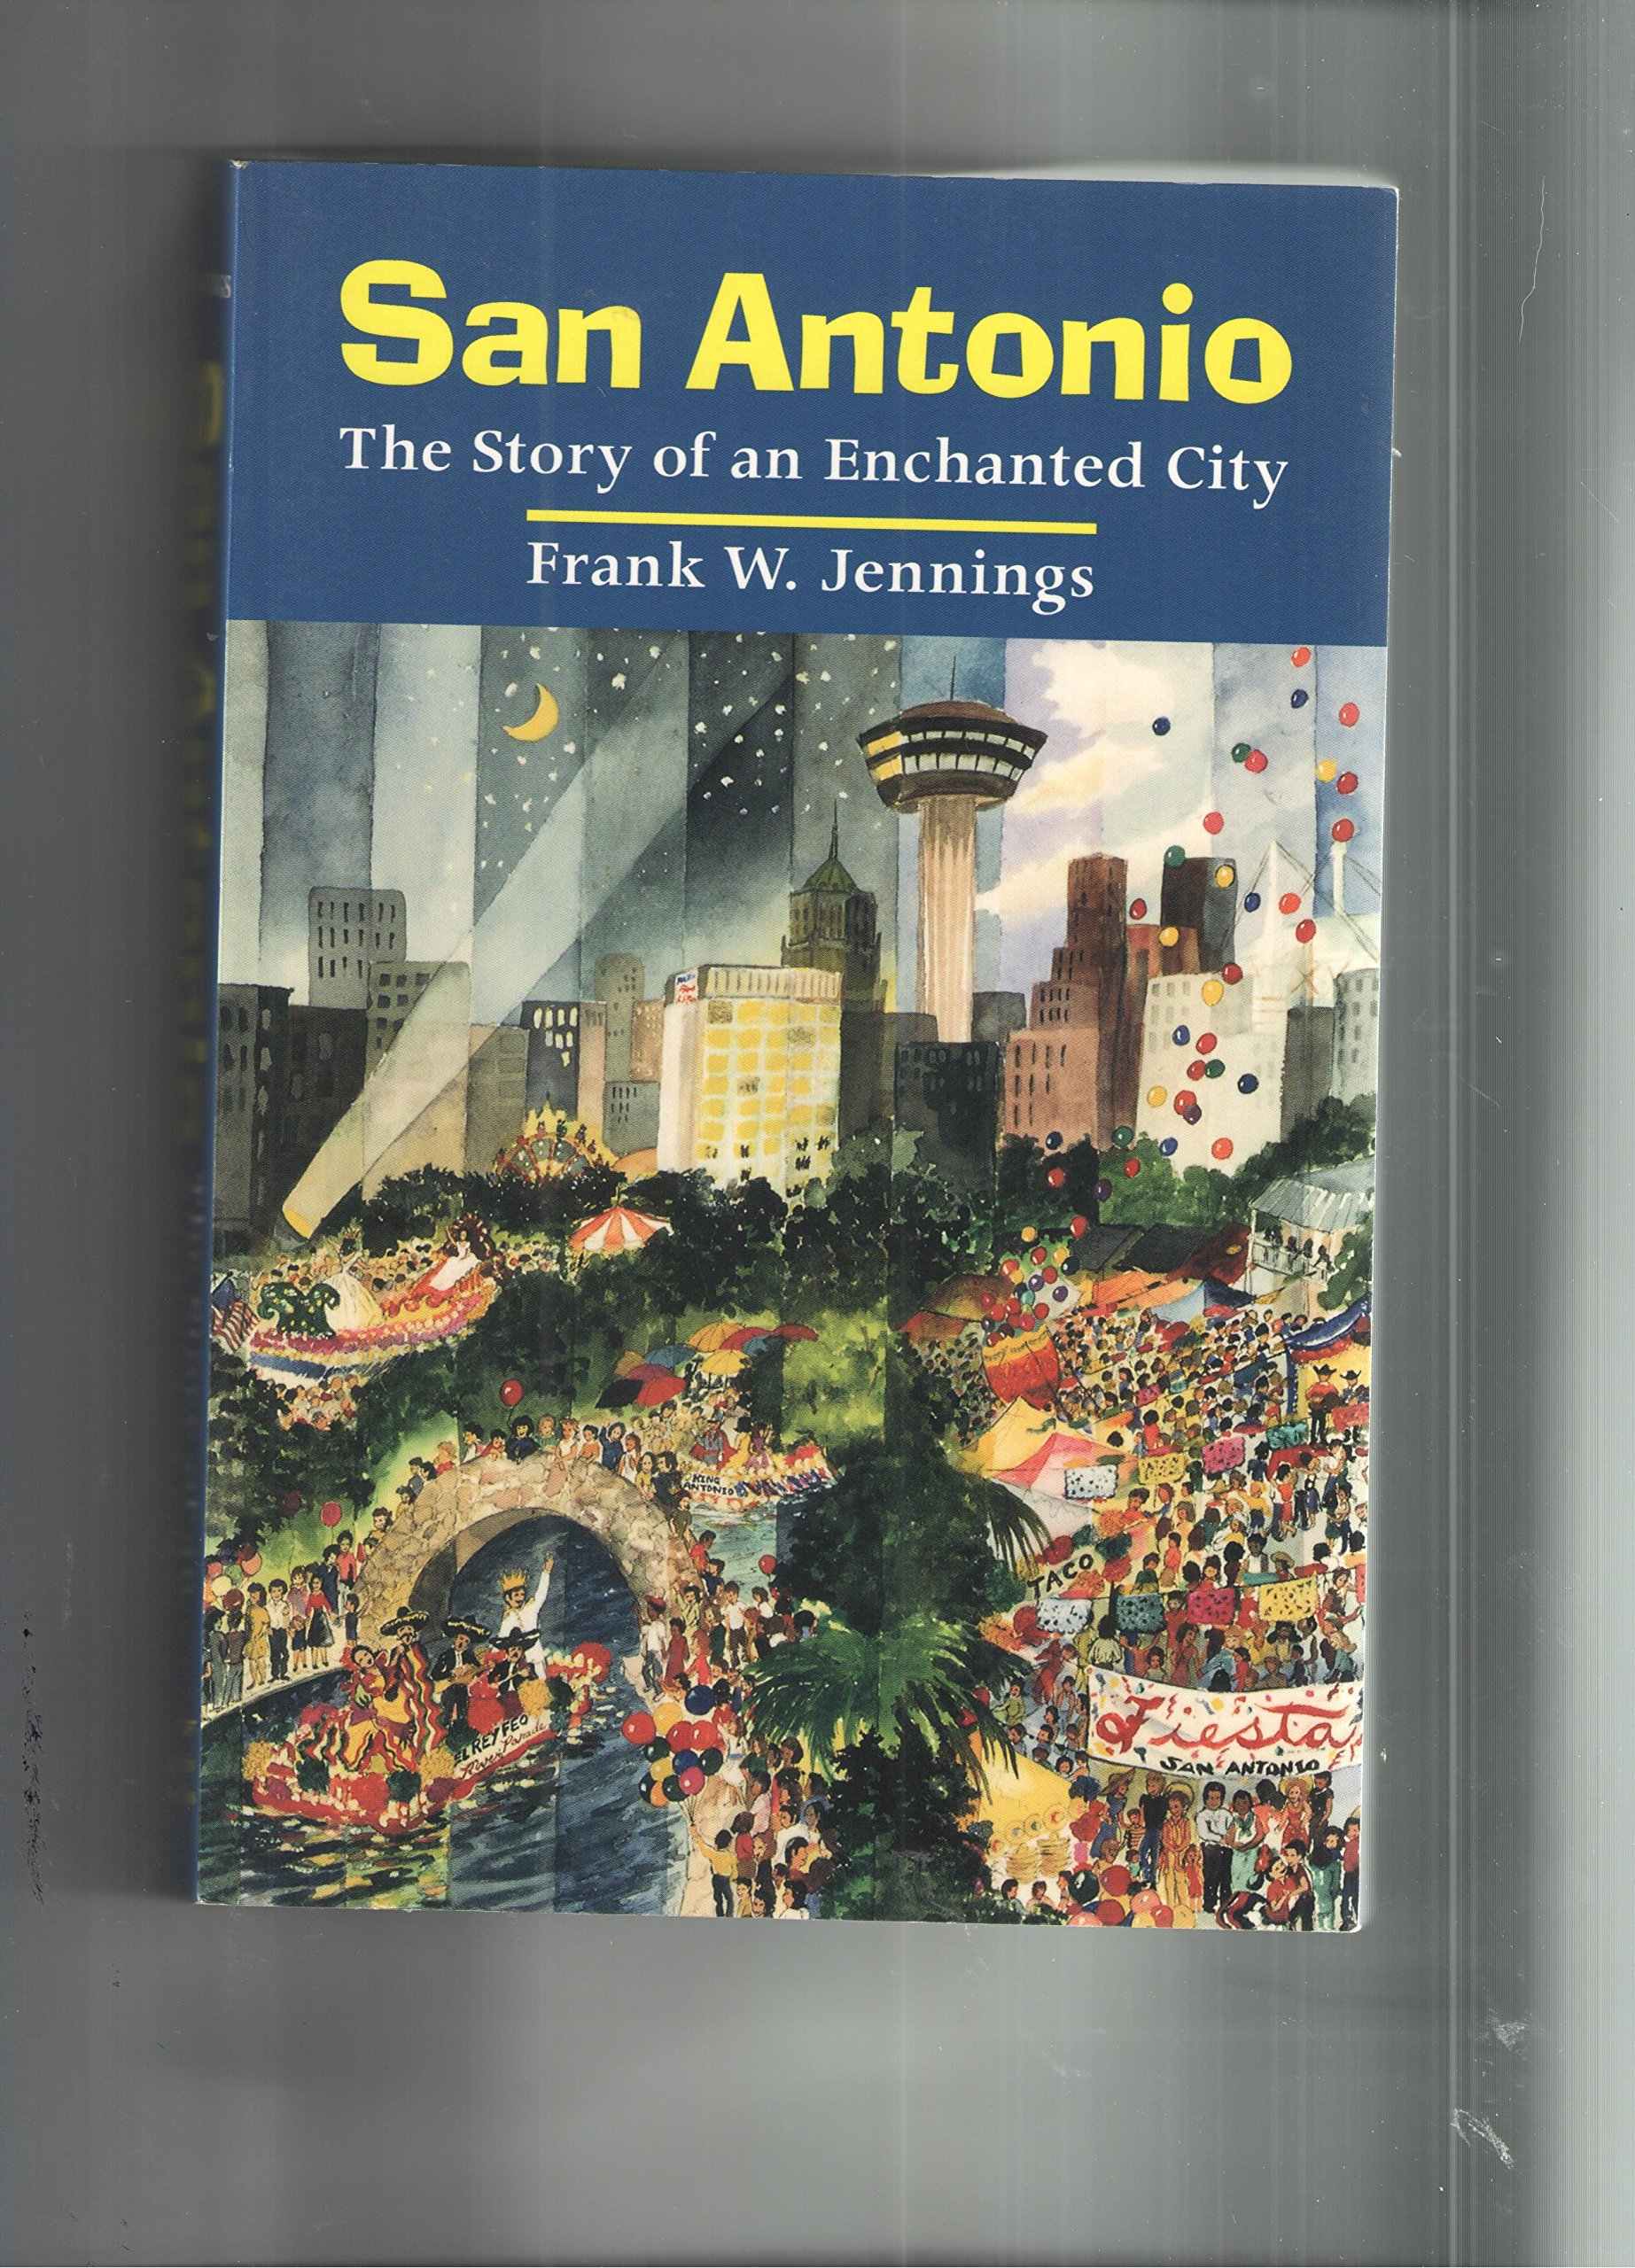 Antonio Enchanted City Frank Jennings product image